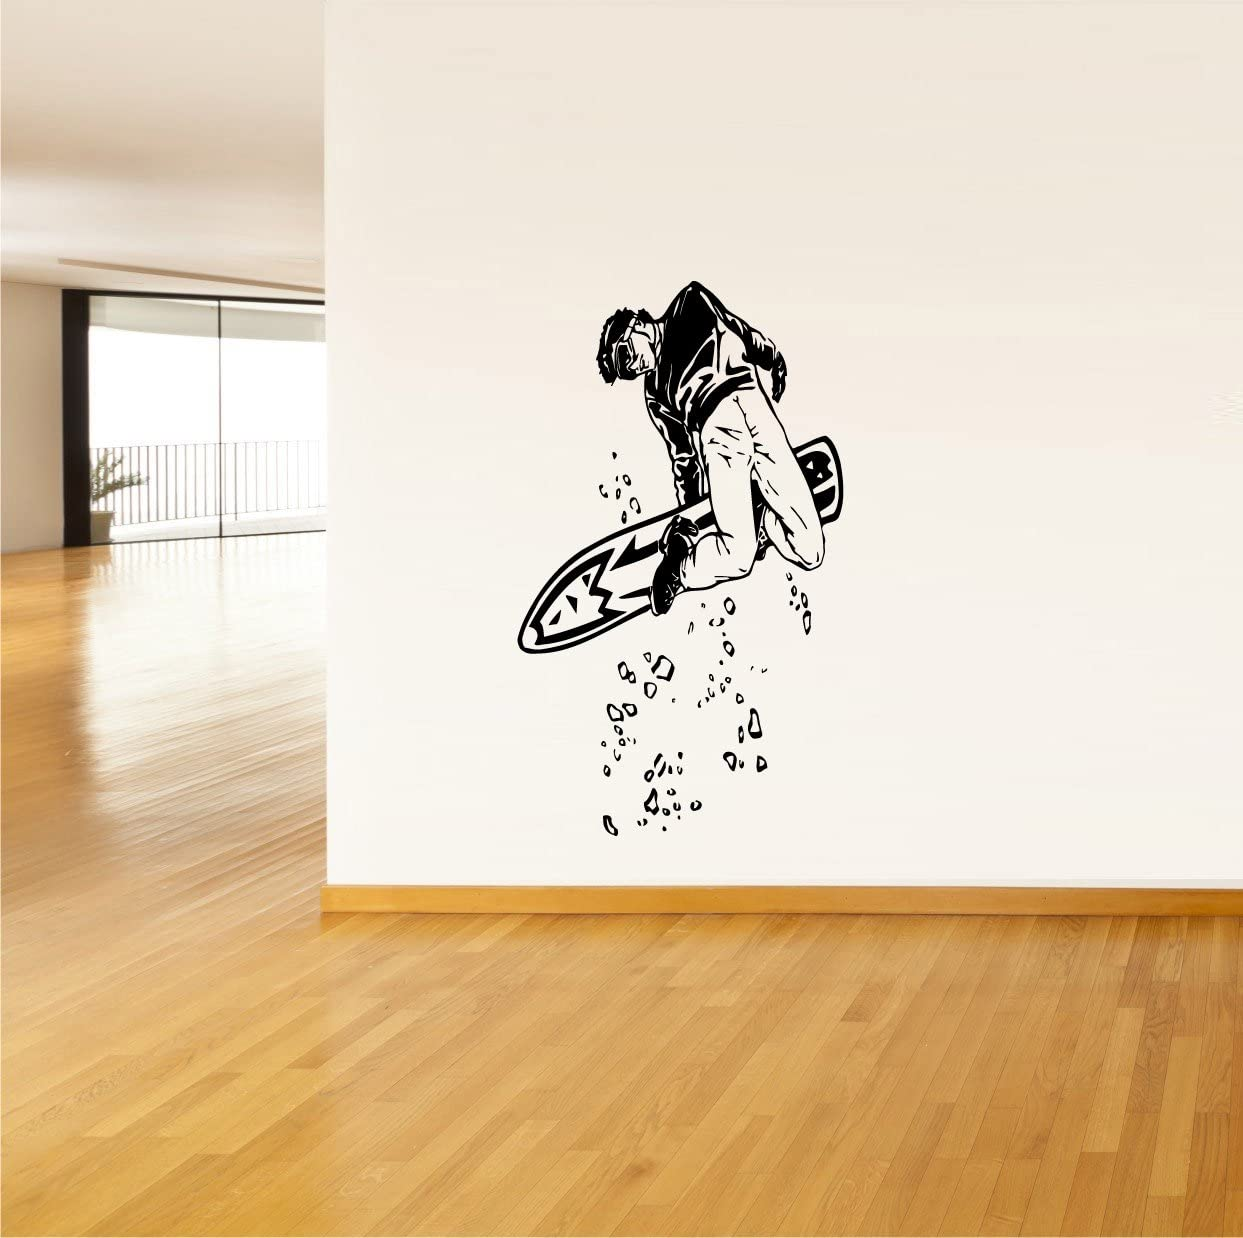 STICKERSFORLIFE Wall Art Vinyl Sticker Decal Mural Design Awesome Cold Winter Sport Snowbord Snowboarder 617